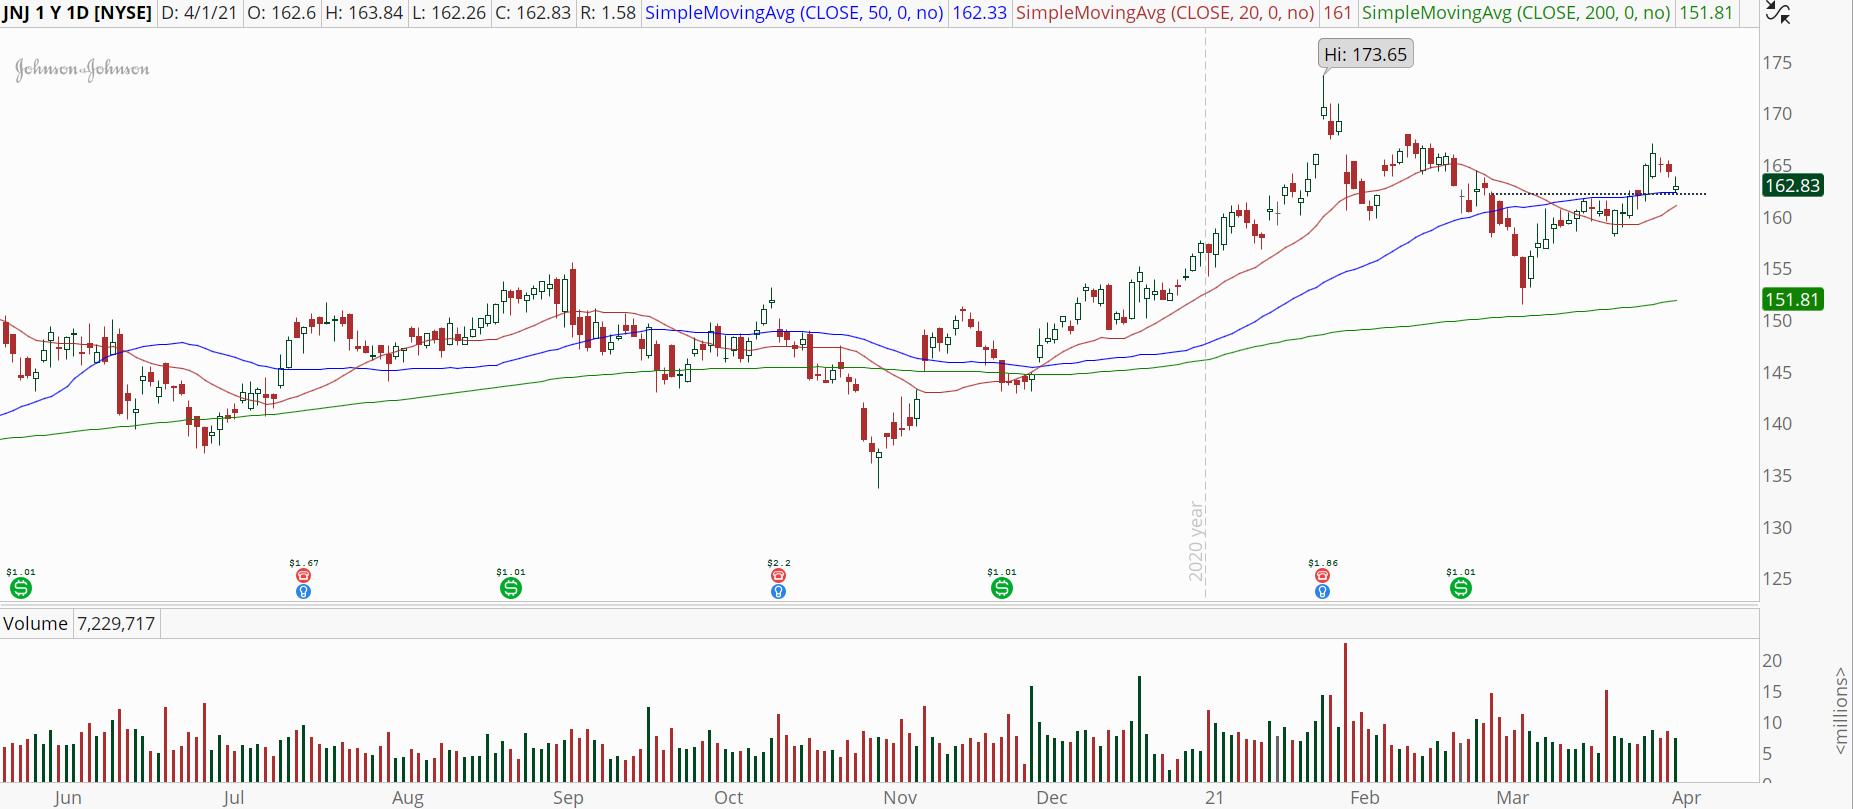 Johnson & Johnson (JNJ) stock chart with pullback to 50-day moving average